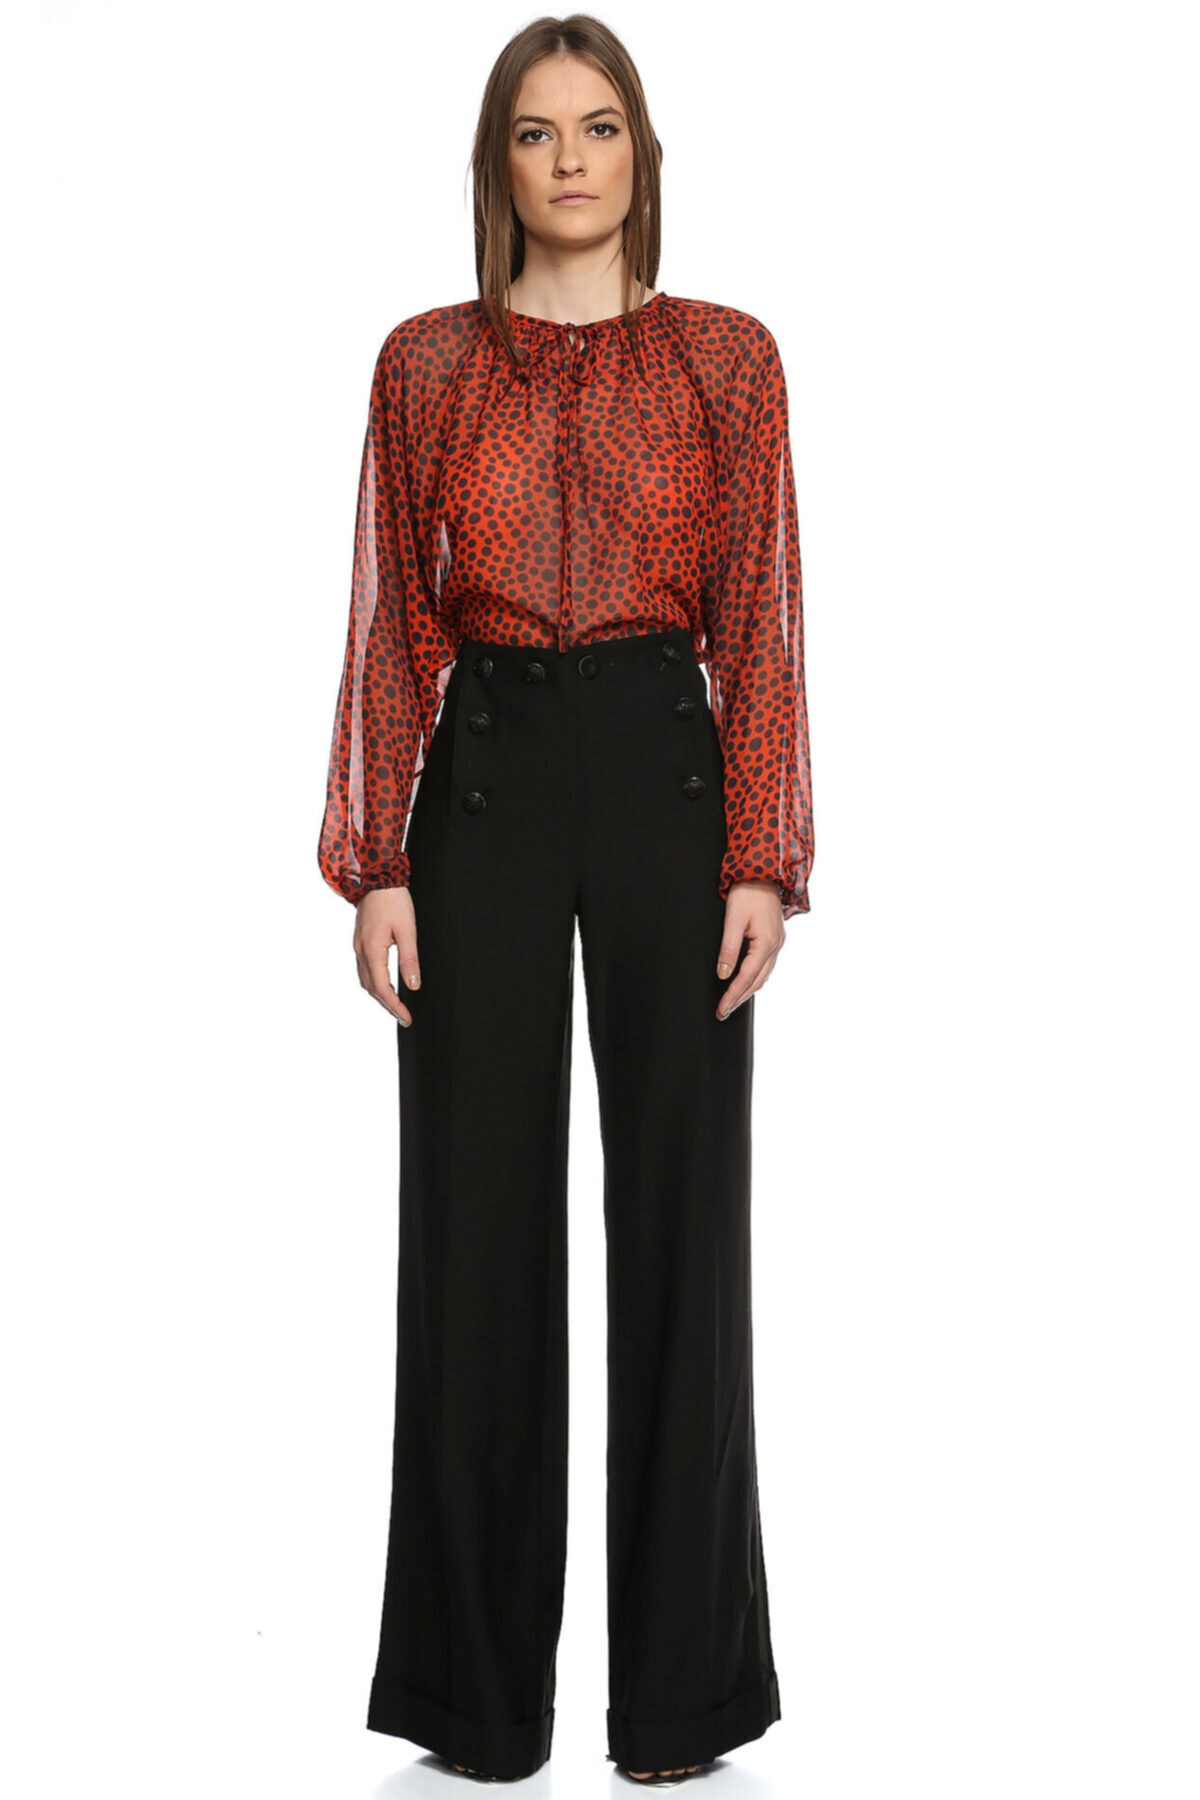 Jean Paul Gaultier Kadın Siyah Bol Paça Pantolon 2